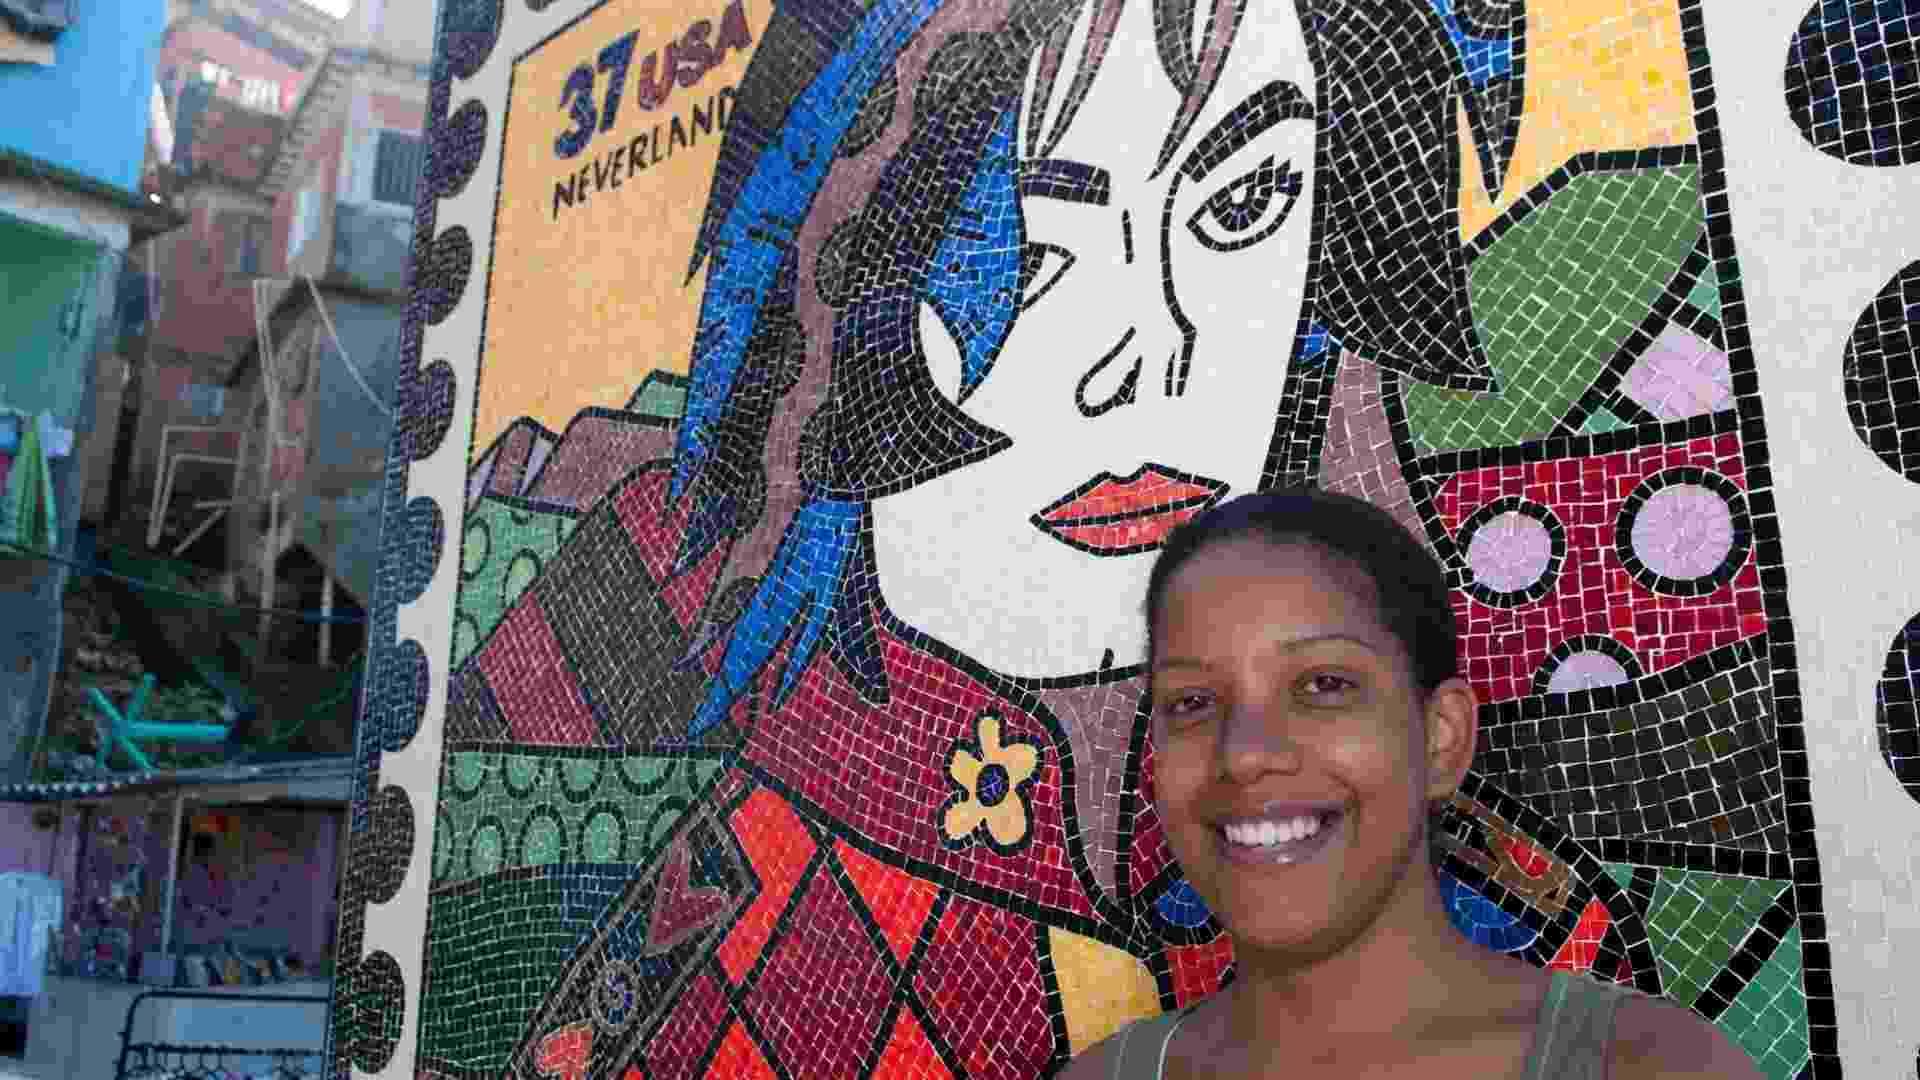 Andréia Miranda, empreendedora do Morro Santa Marta, no Rio de Janeiro (RJ) - Maria Elisa Franco/UOL